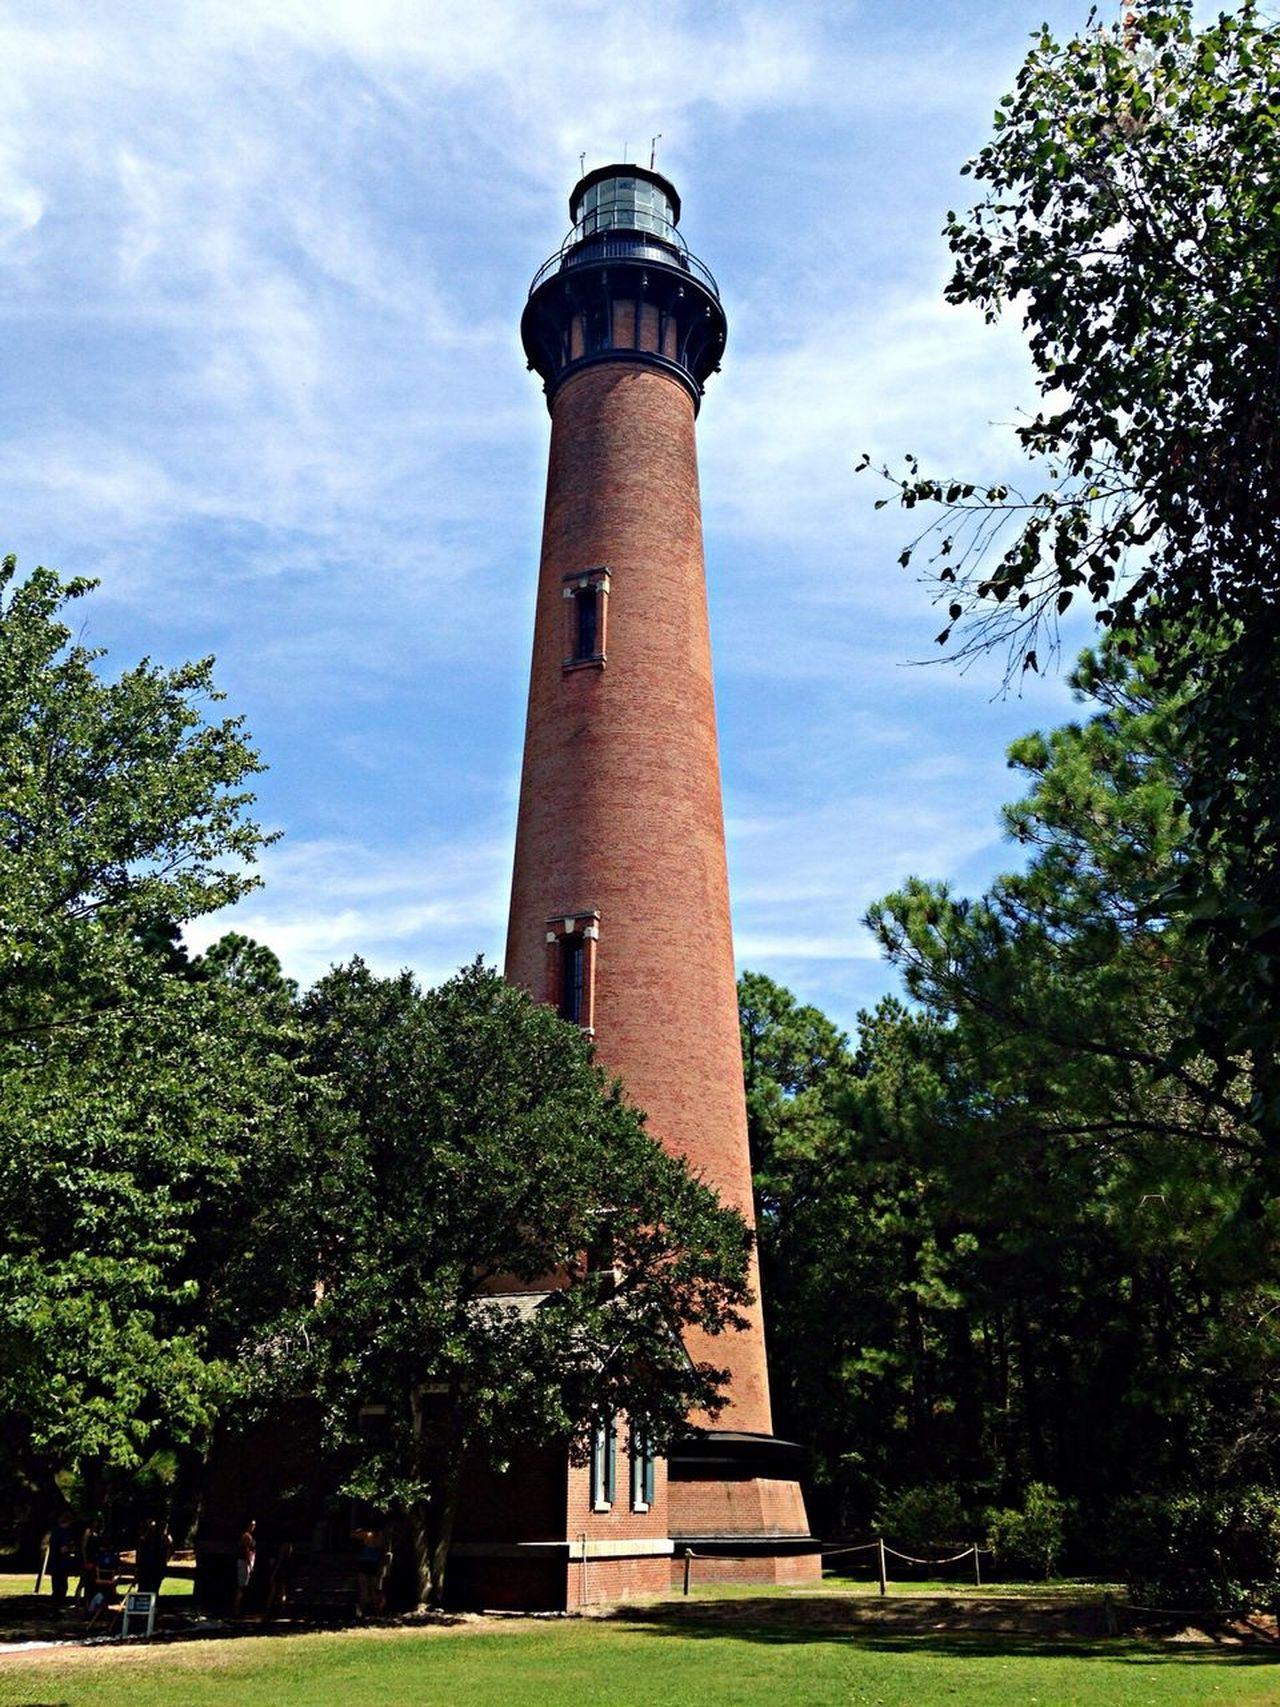 Currituck Beach Lighthouse in North Carolina. OBX14 Lighthouse